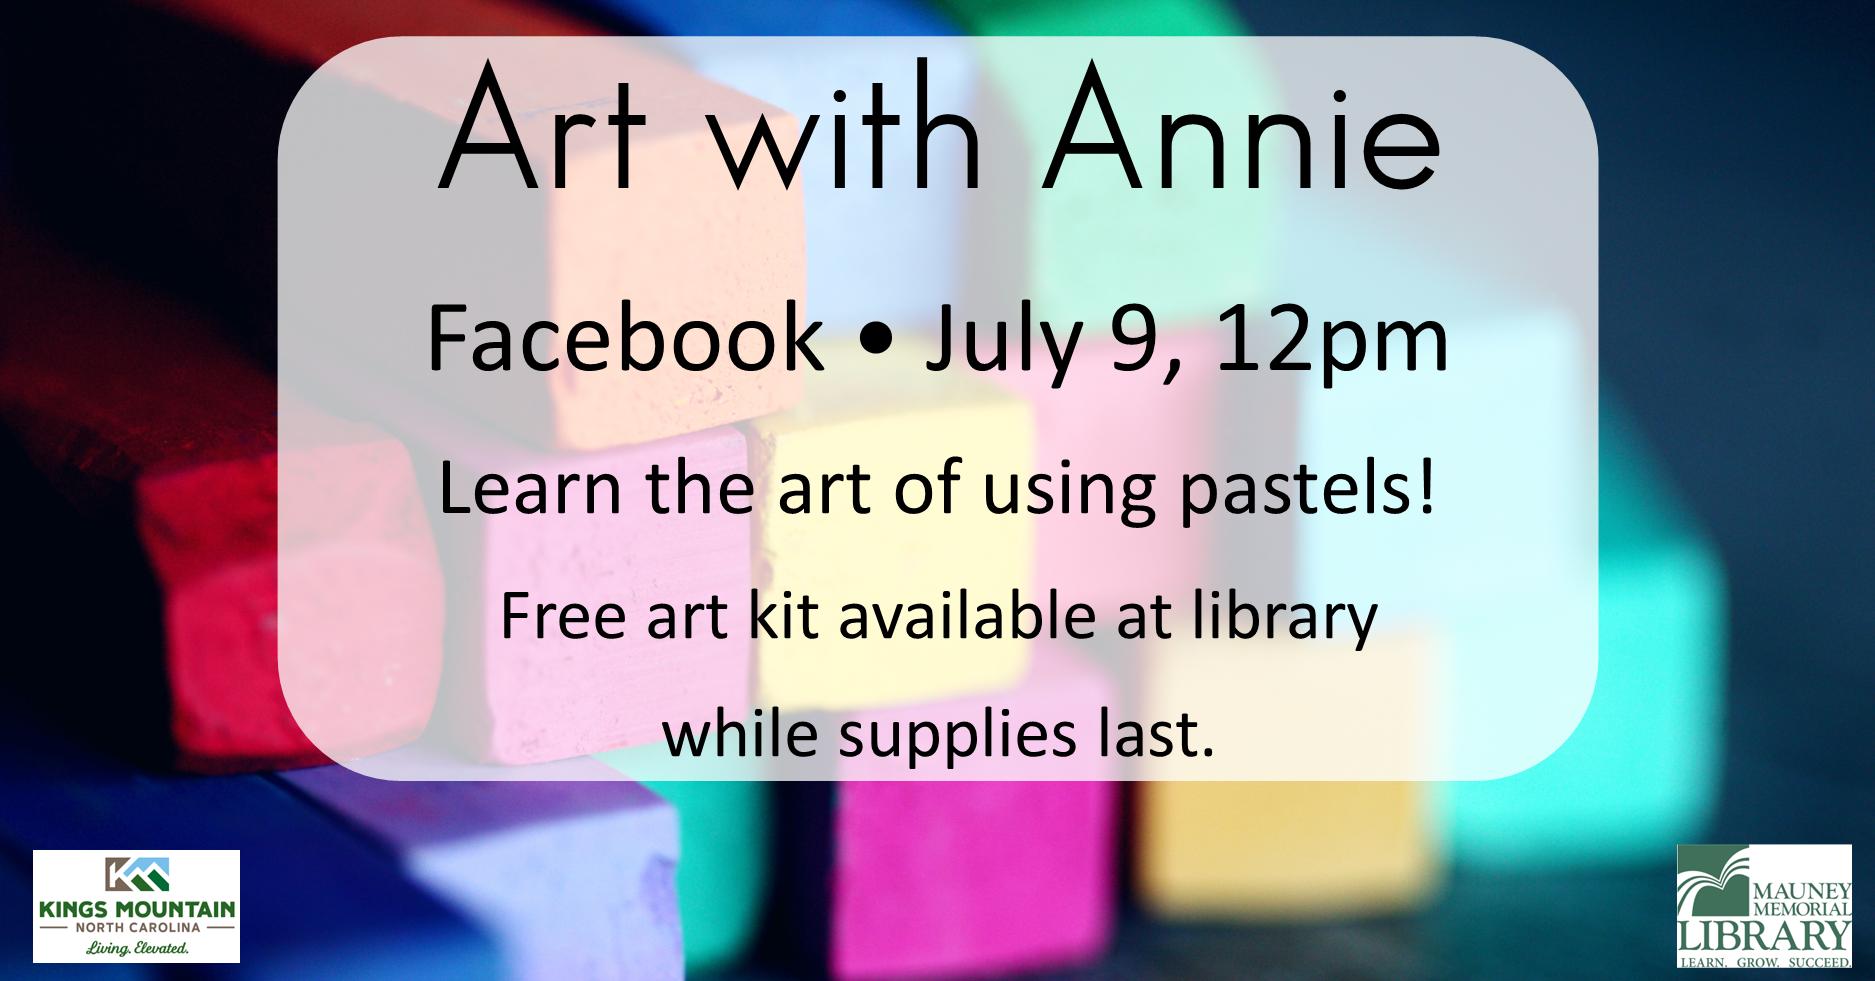 Art with Annie